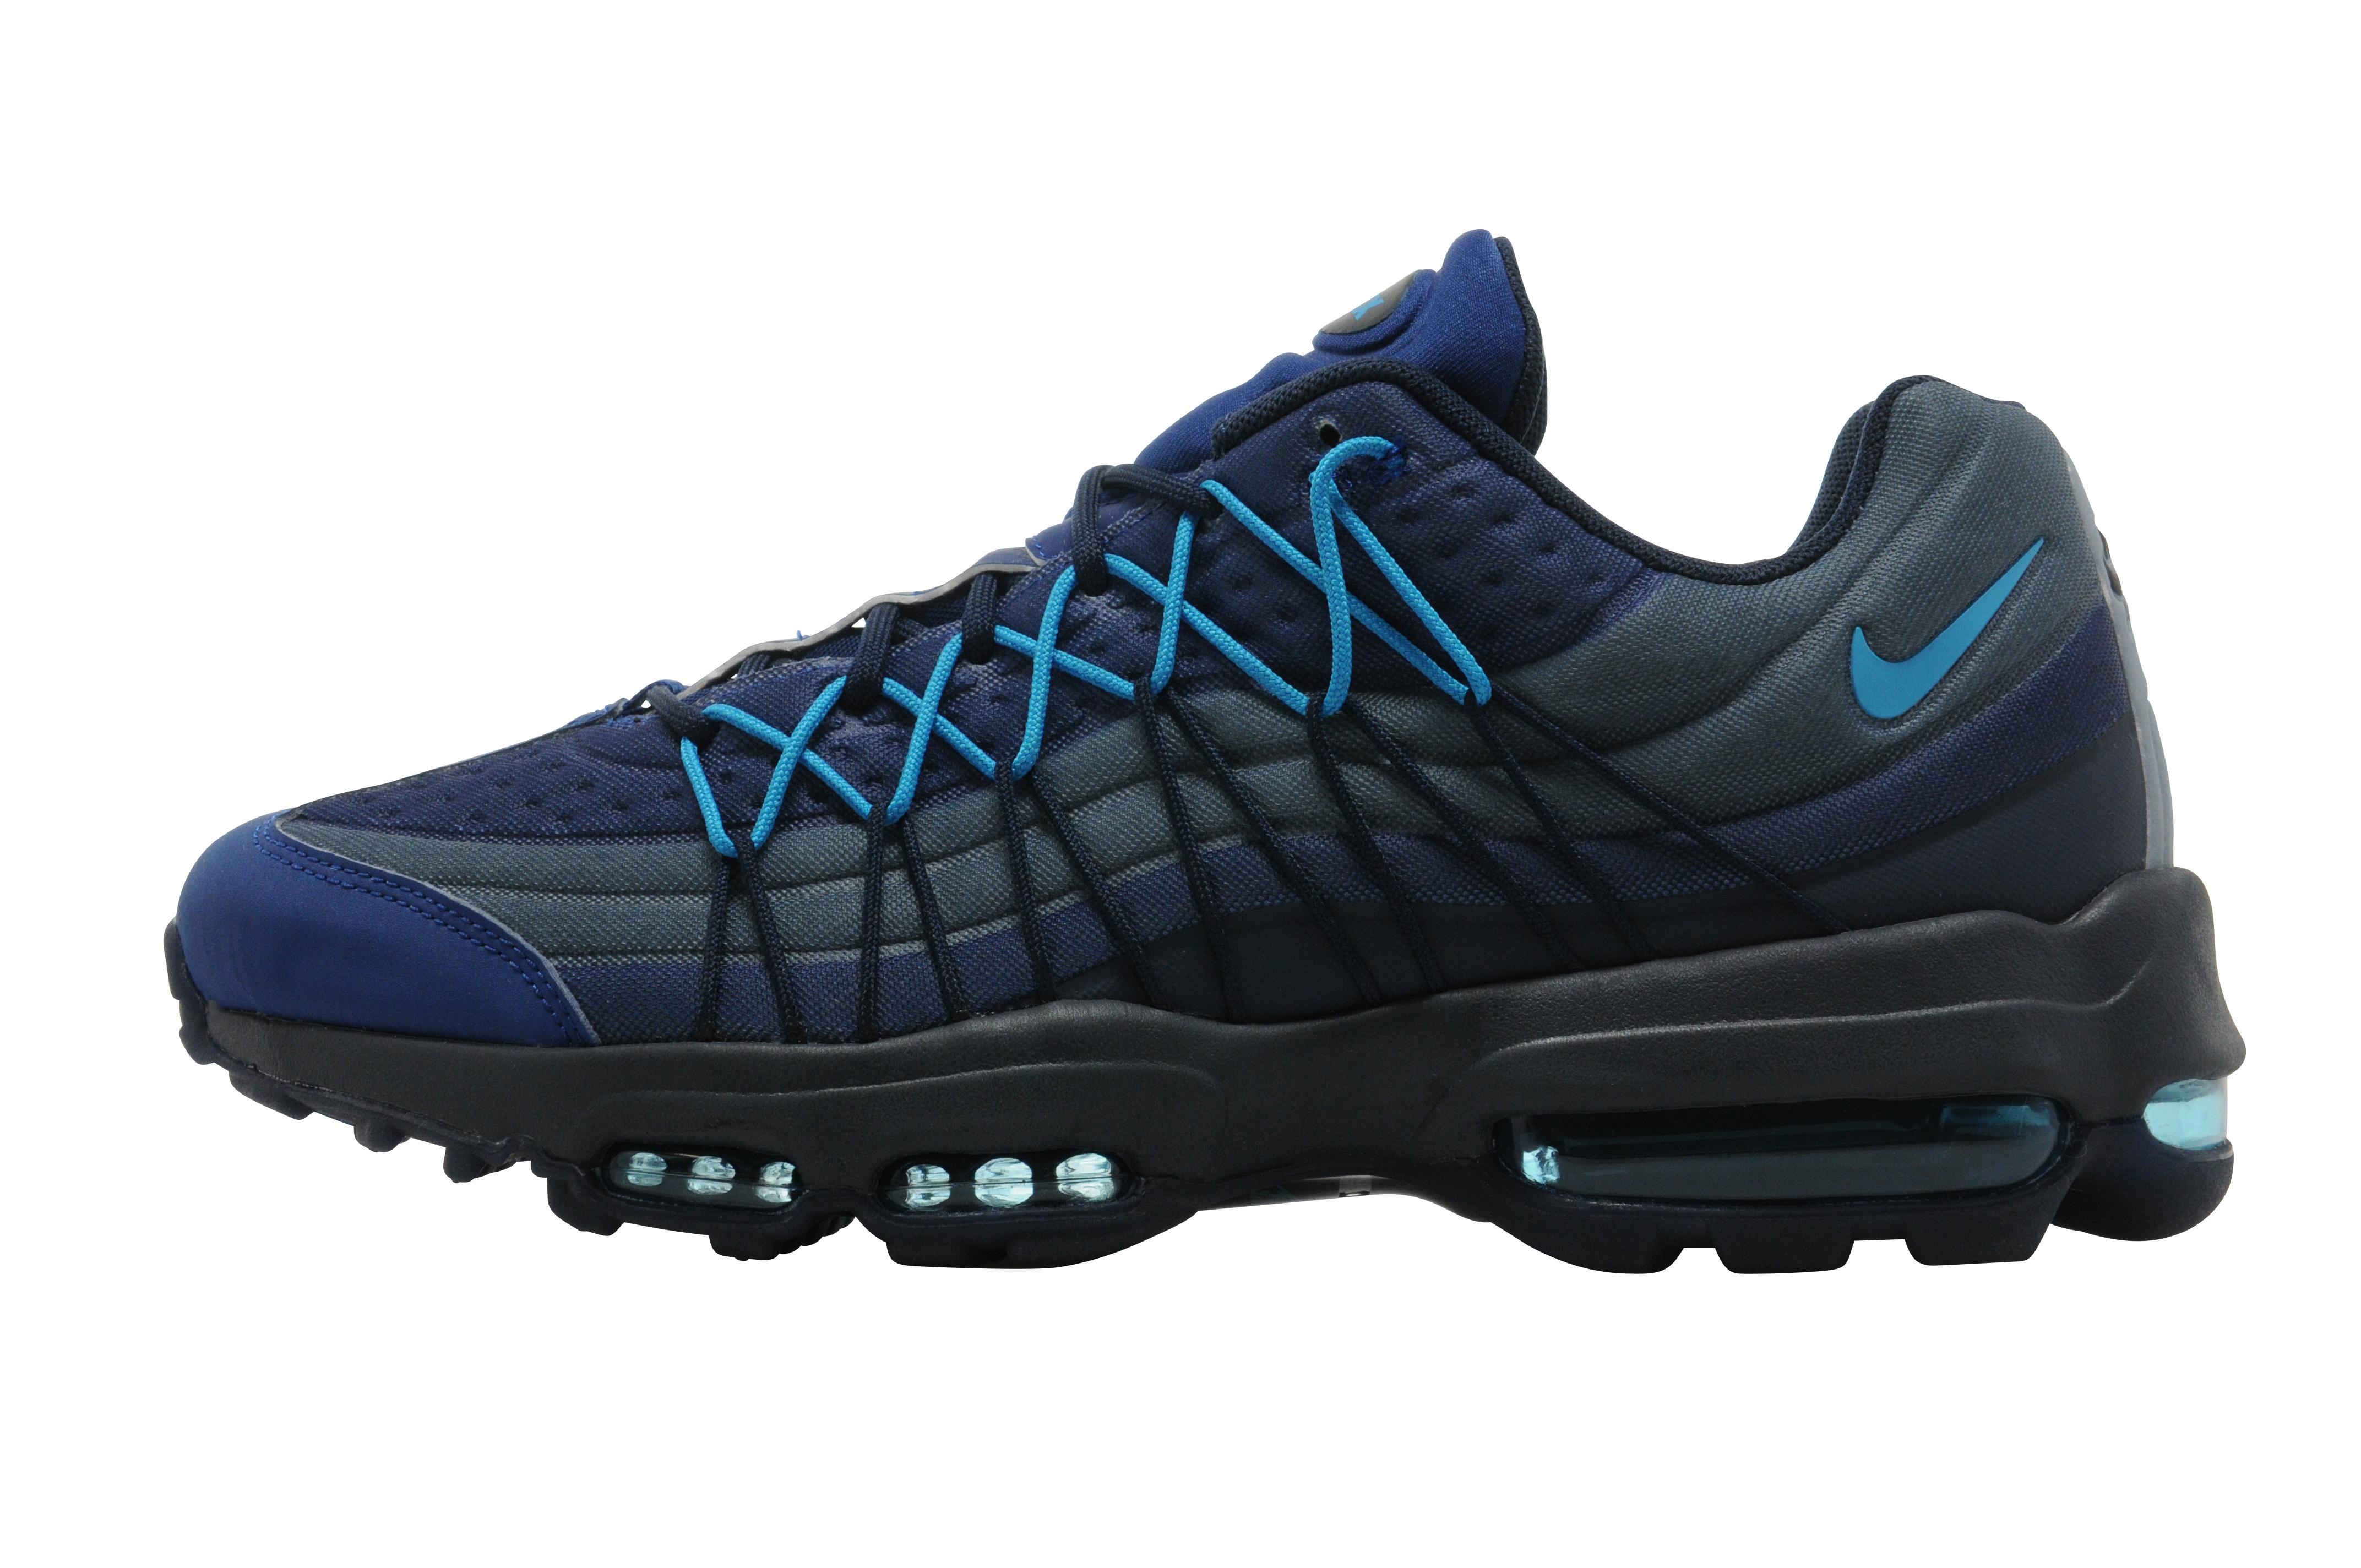 4421e2abc1 Exclusive, Cream www.jdsports.co.uk Nike Air Max ...